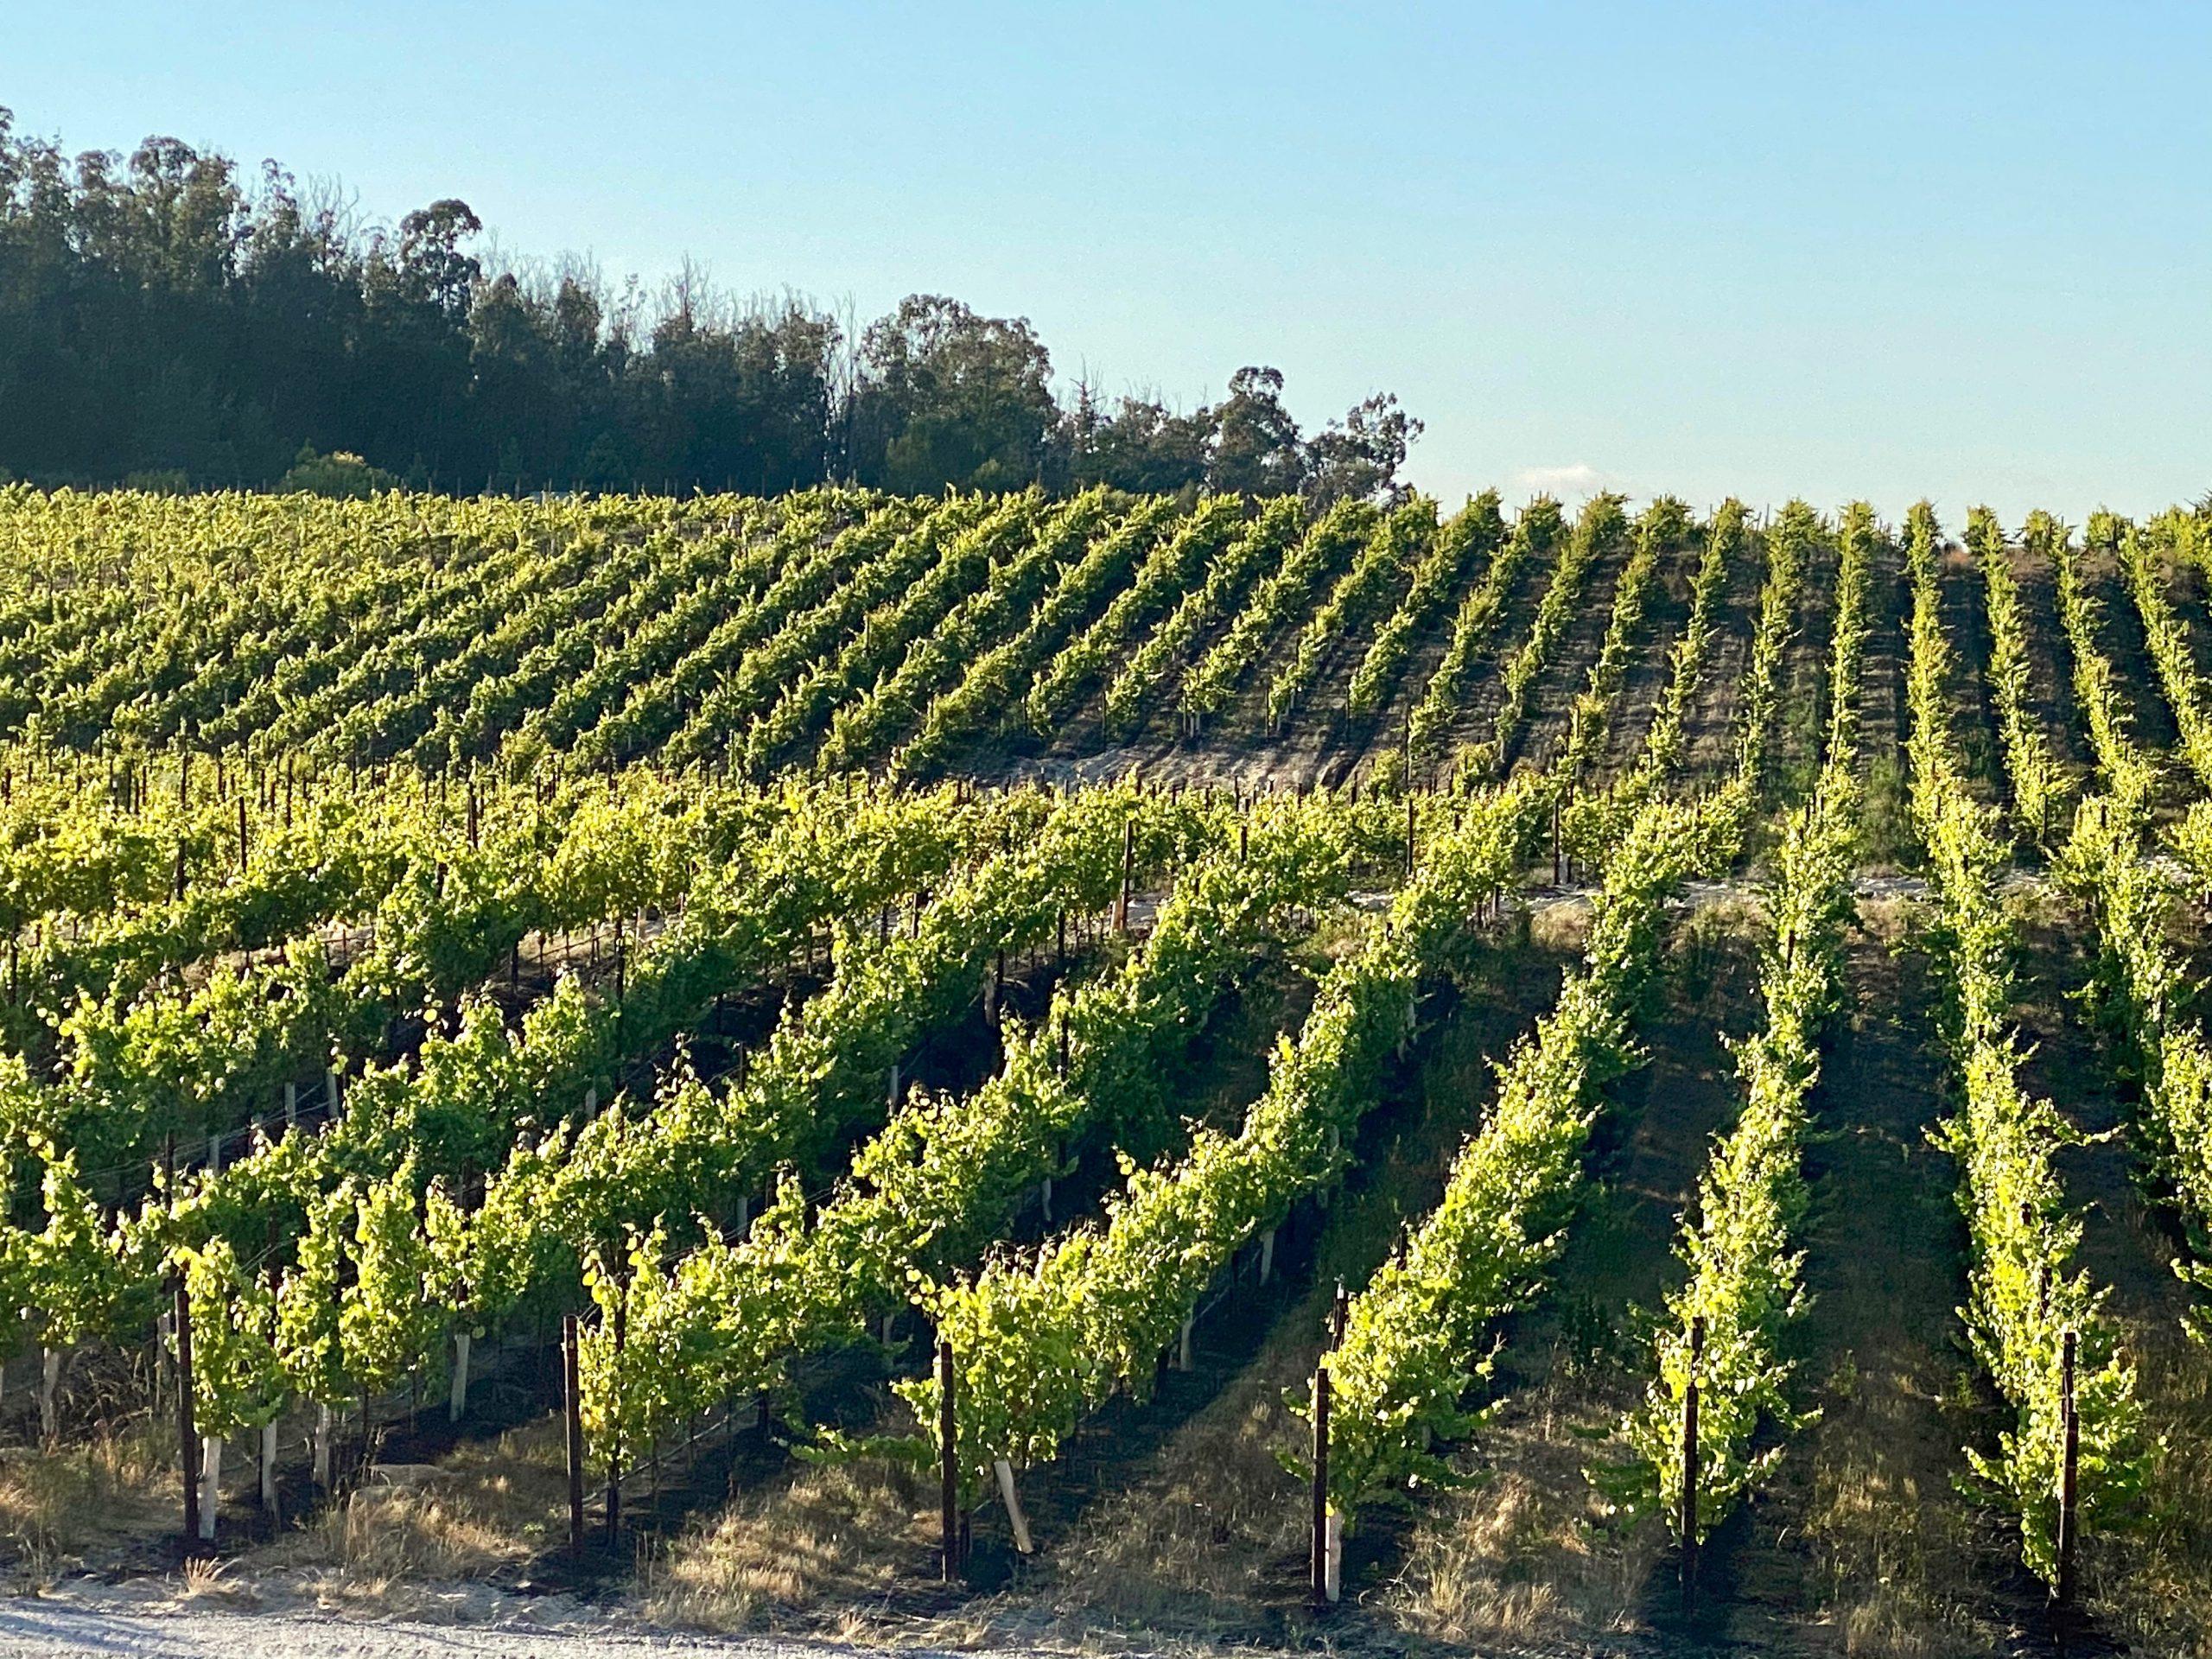 Vineyards near Paso Robles, CA